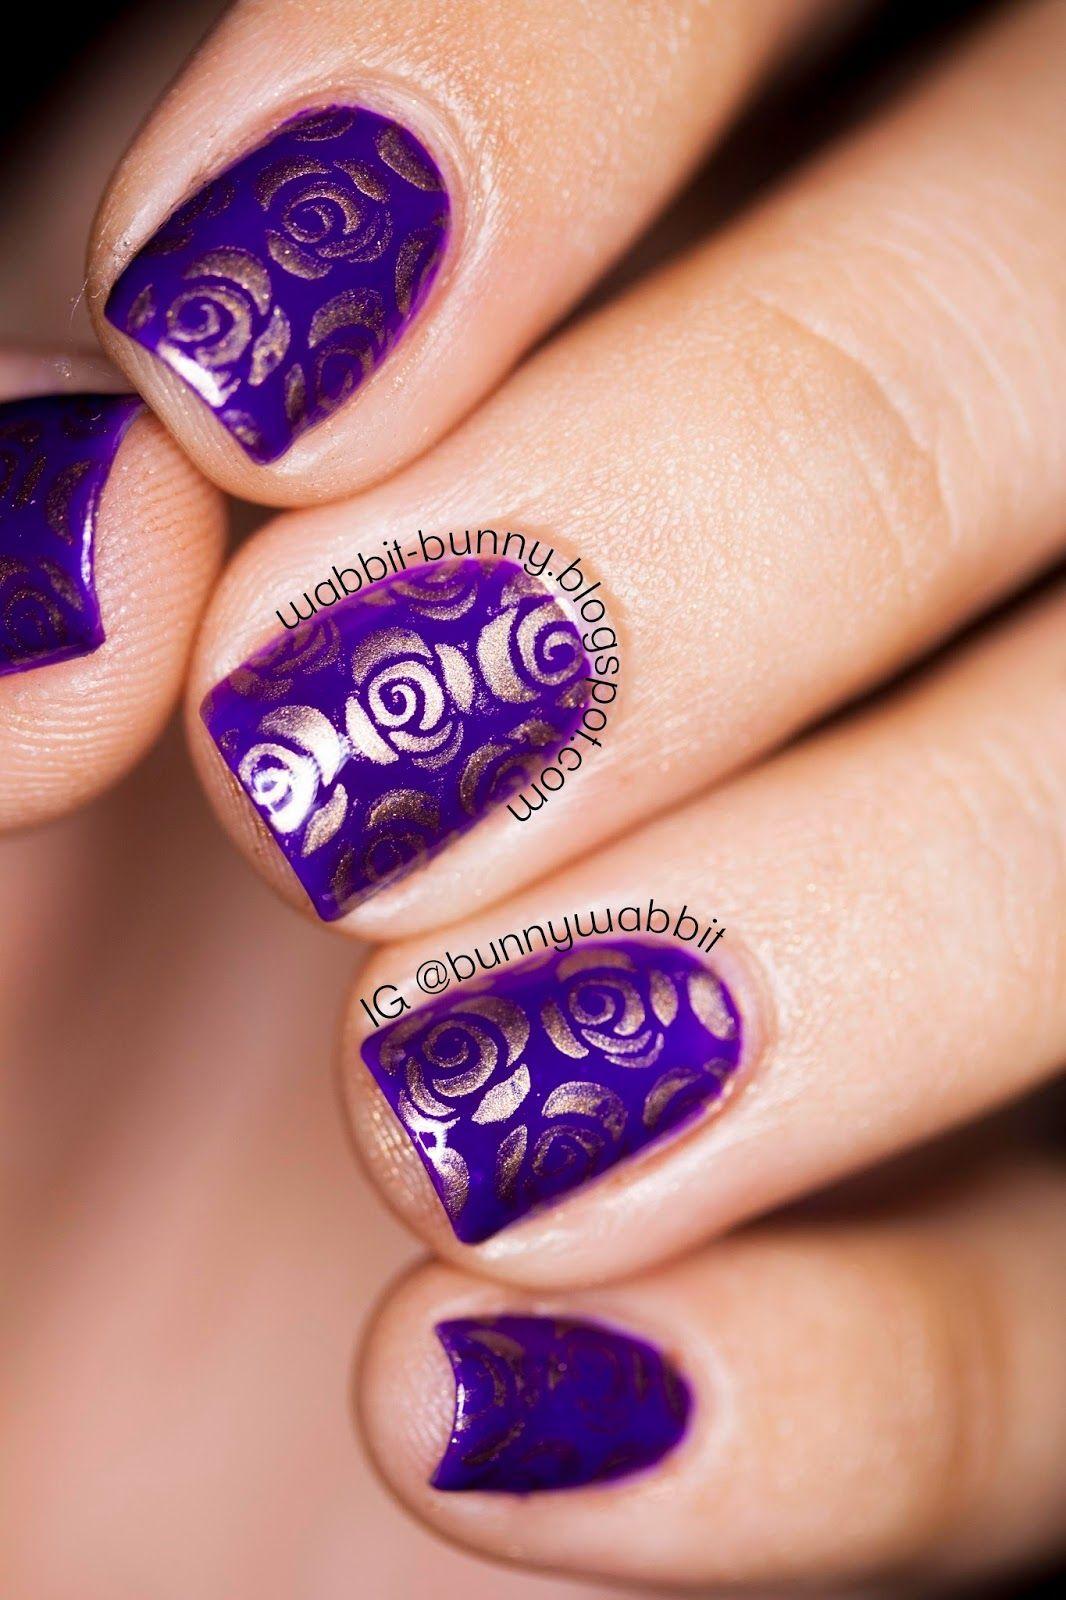 Wabbit Bunny Roses Are Violet Orly Nailart Nail Art Community